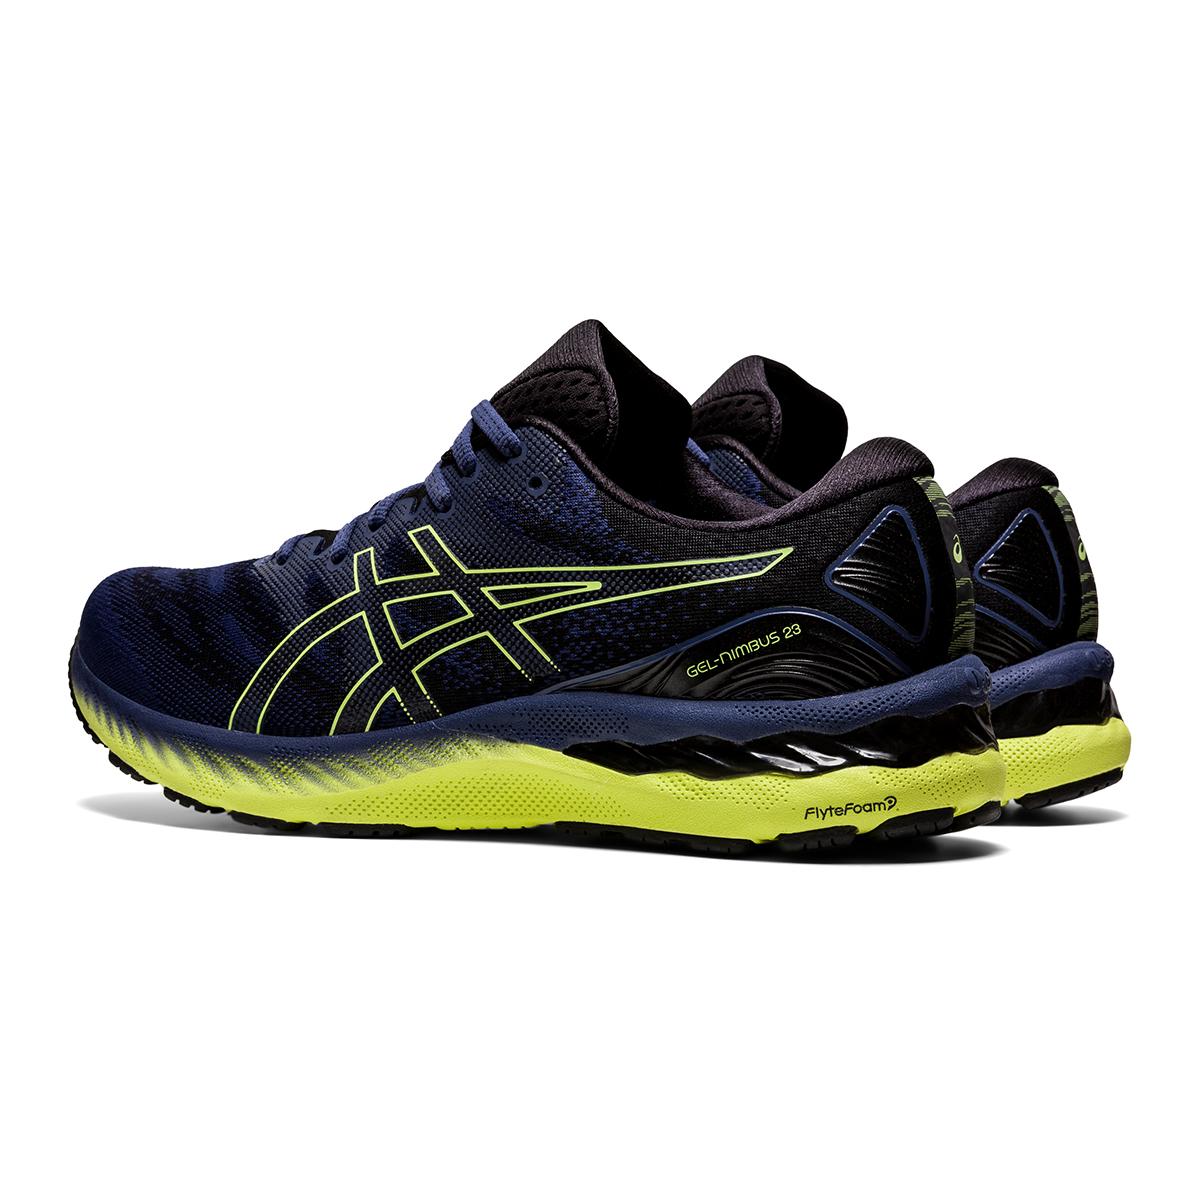 Men's Asics Gel-Nimbus 23 Running Shoe - Color: Thunder Blue - Size: 7 - Width: Regular, Thunder Blue, large, image 4